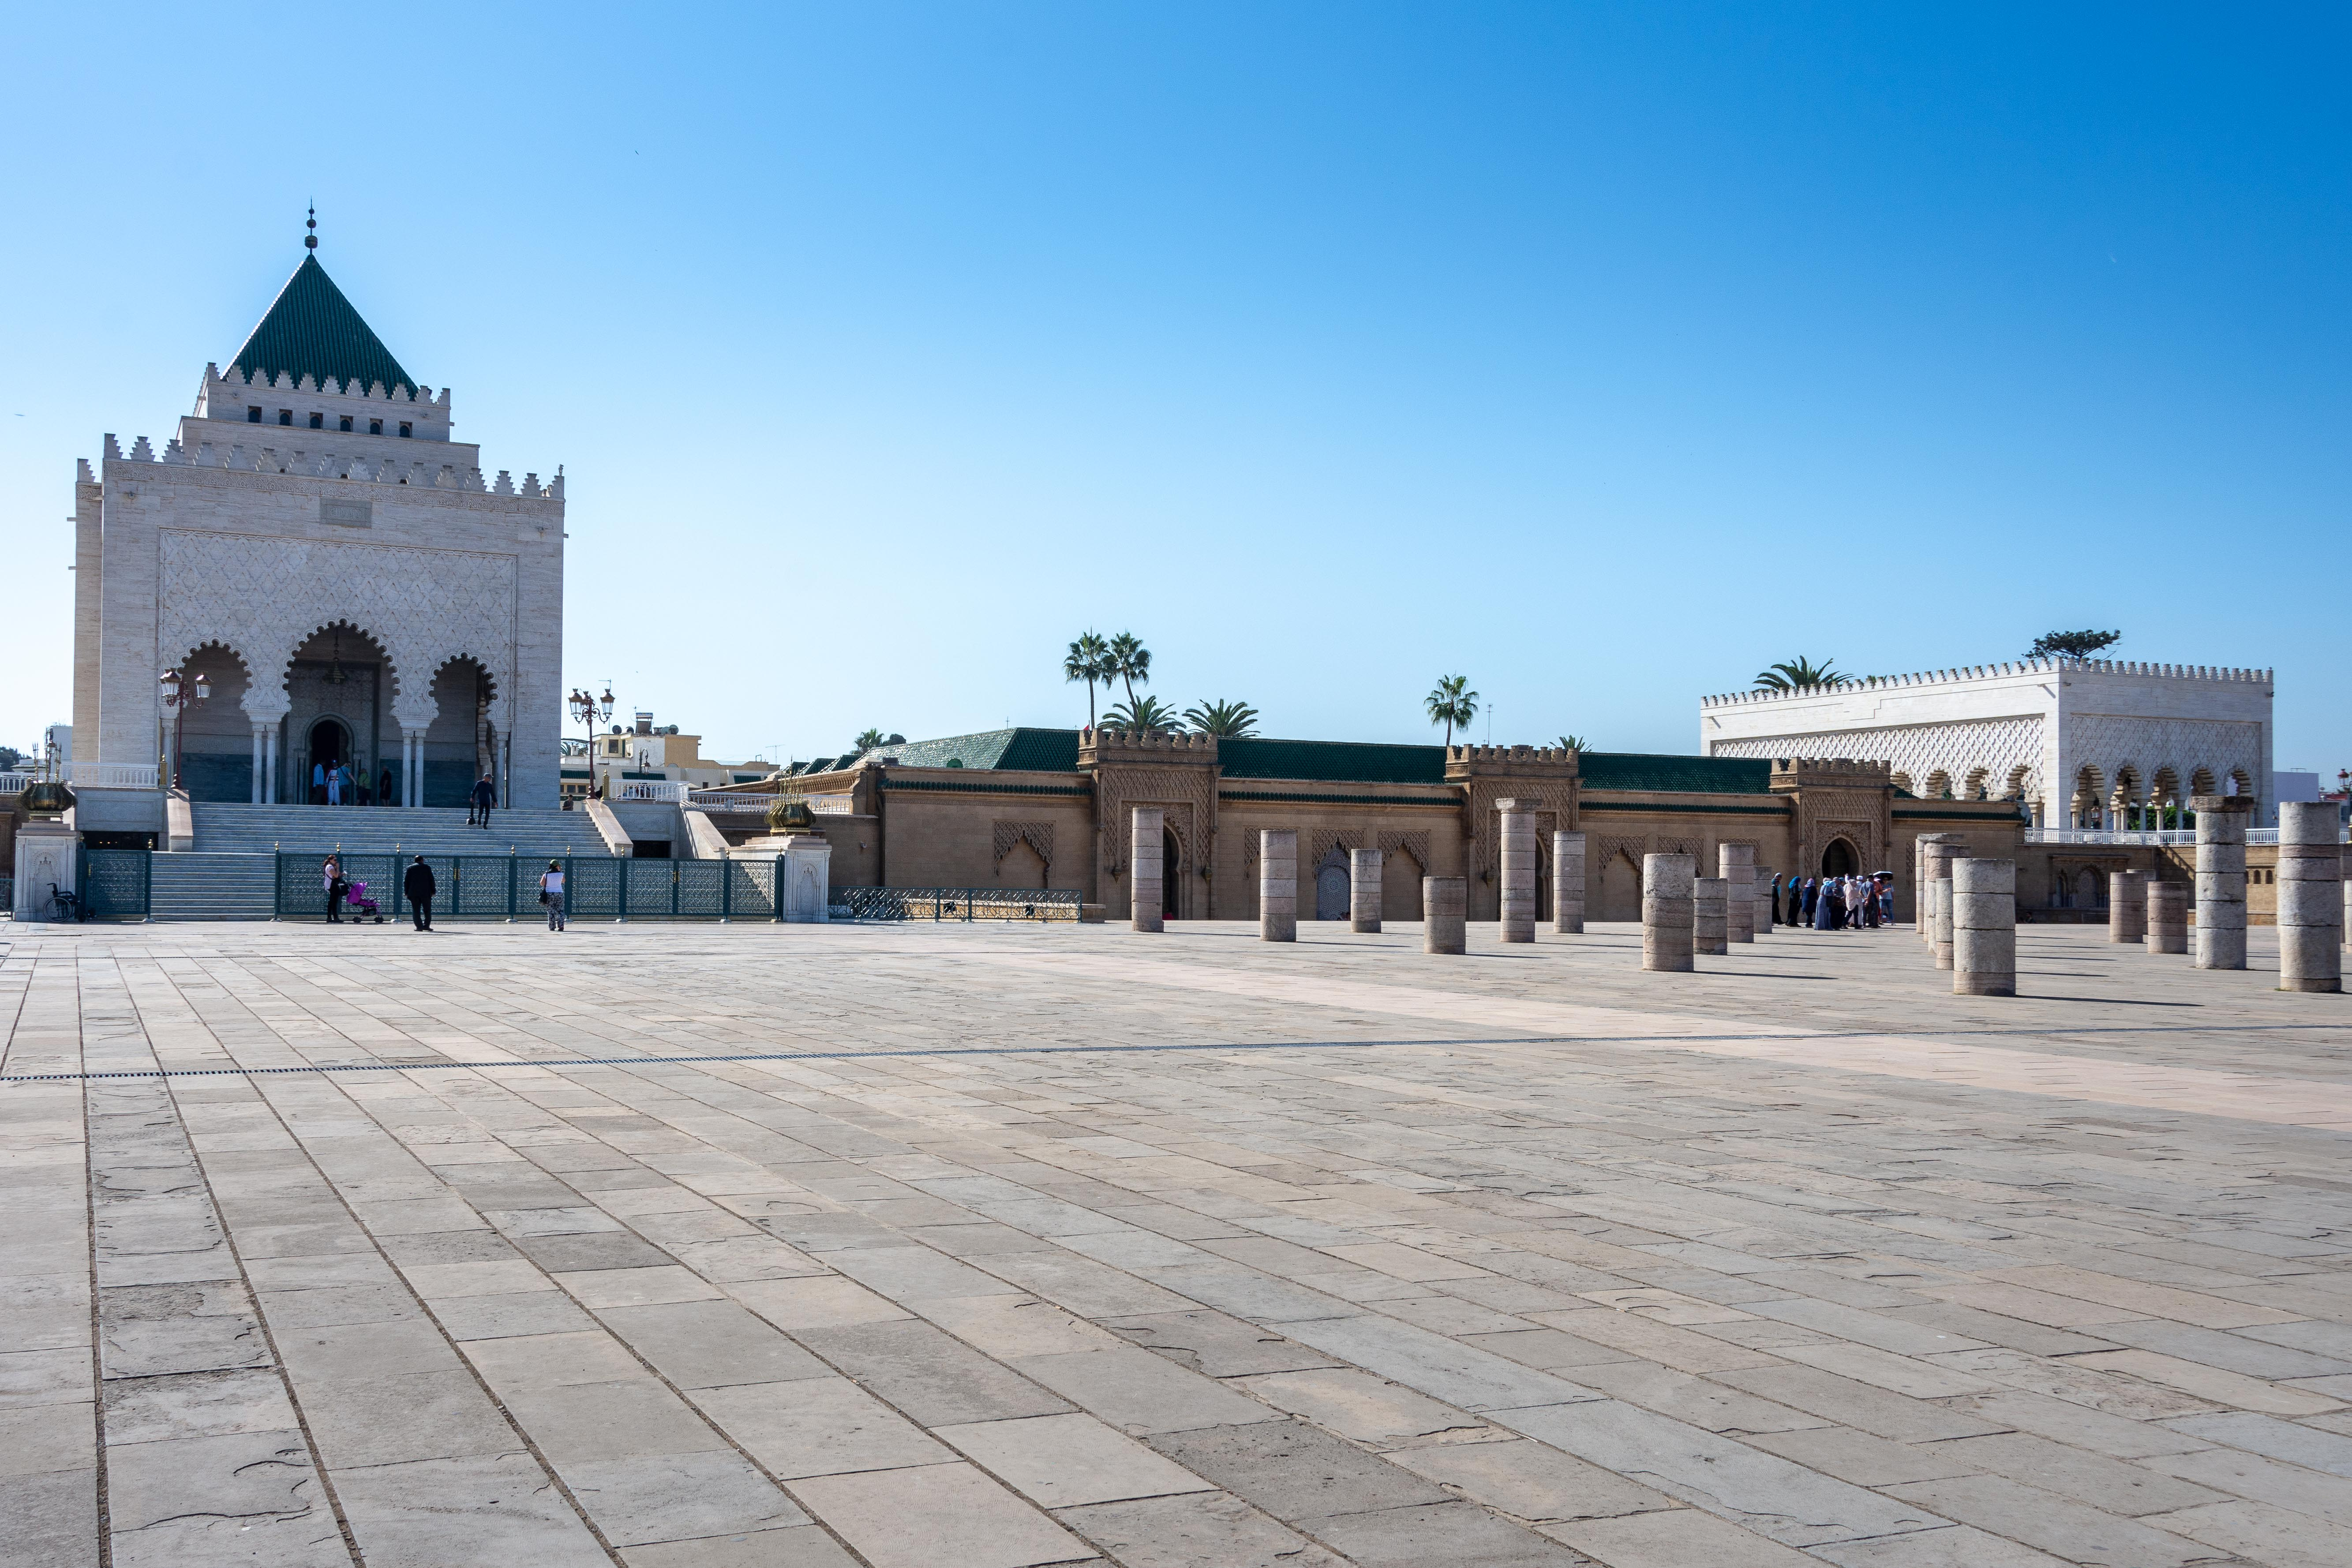 20181002_Marokko_033